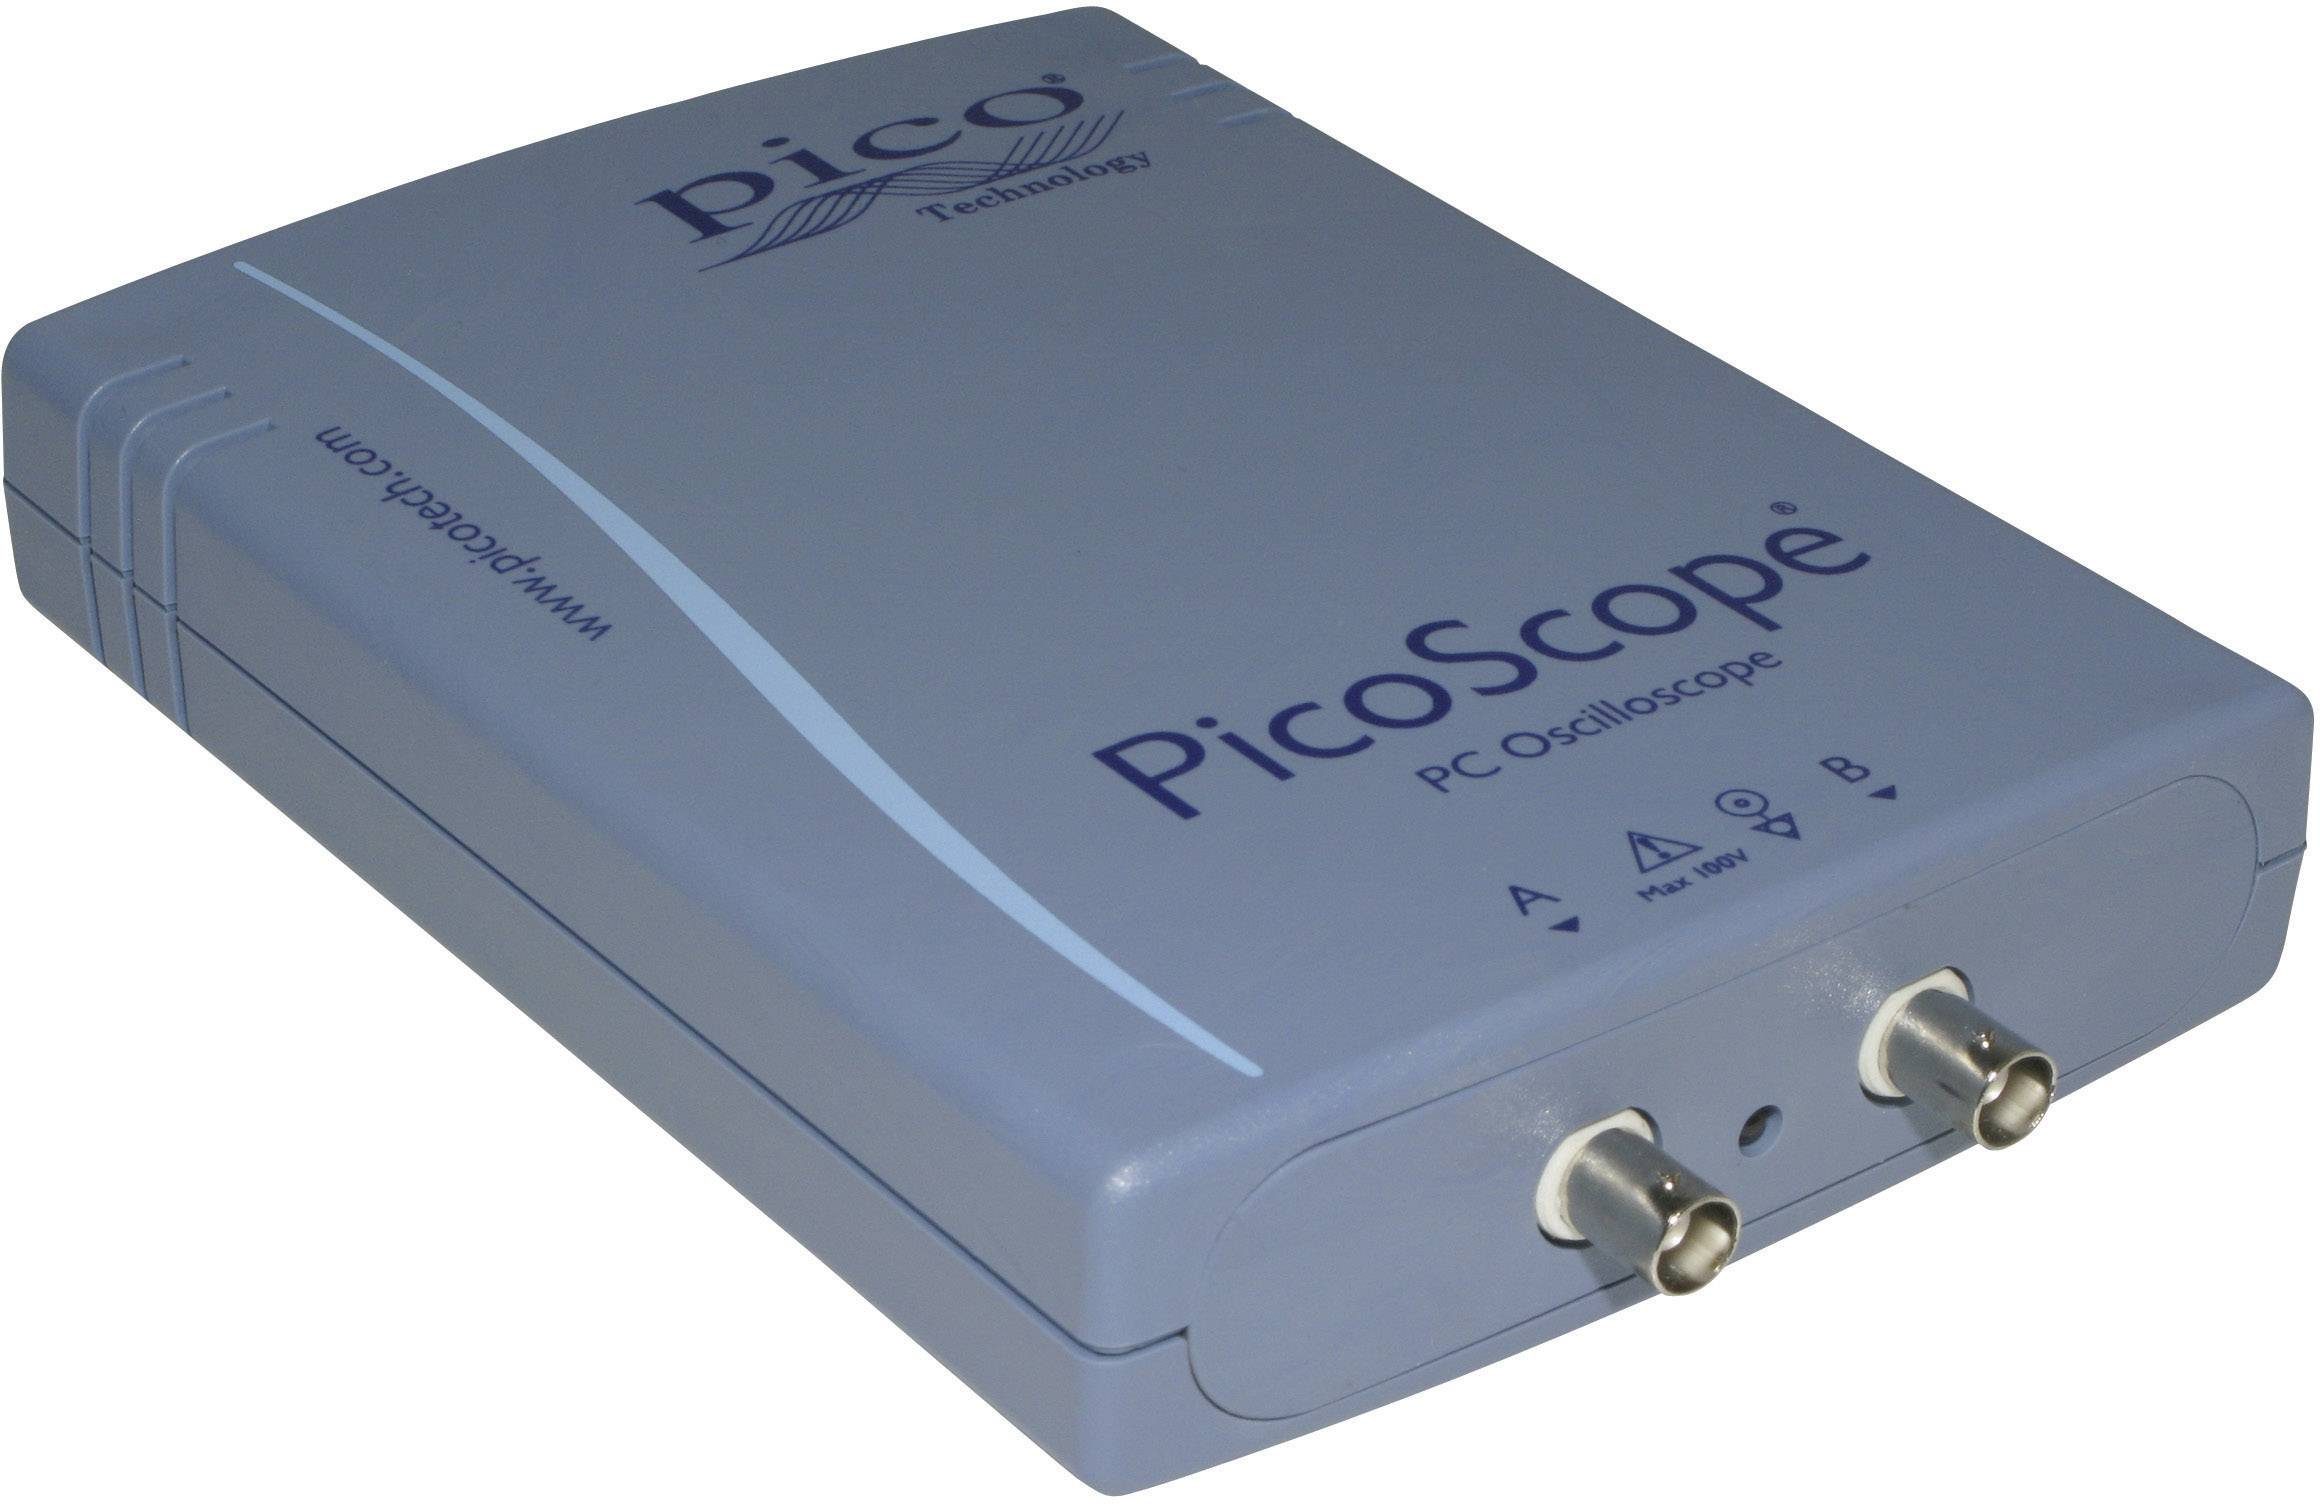 USB osciloskop pico PP478, 20 MHz, 2kanálová